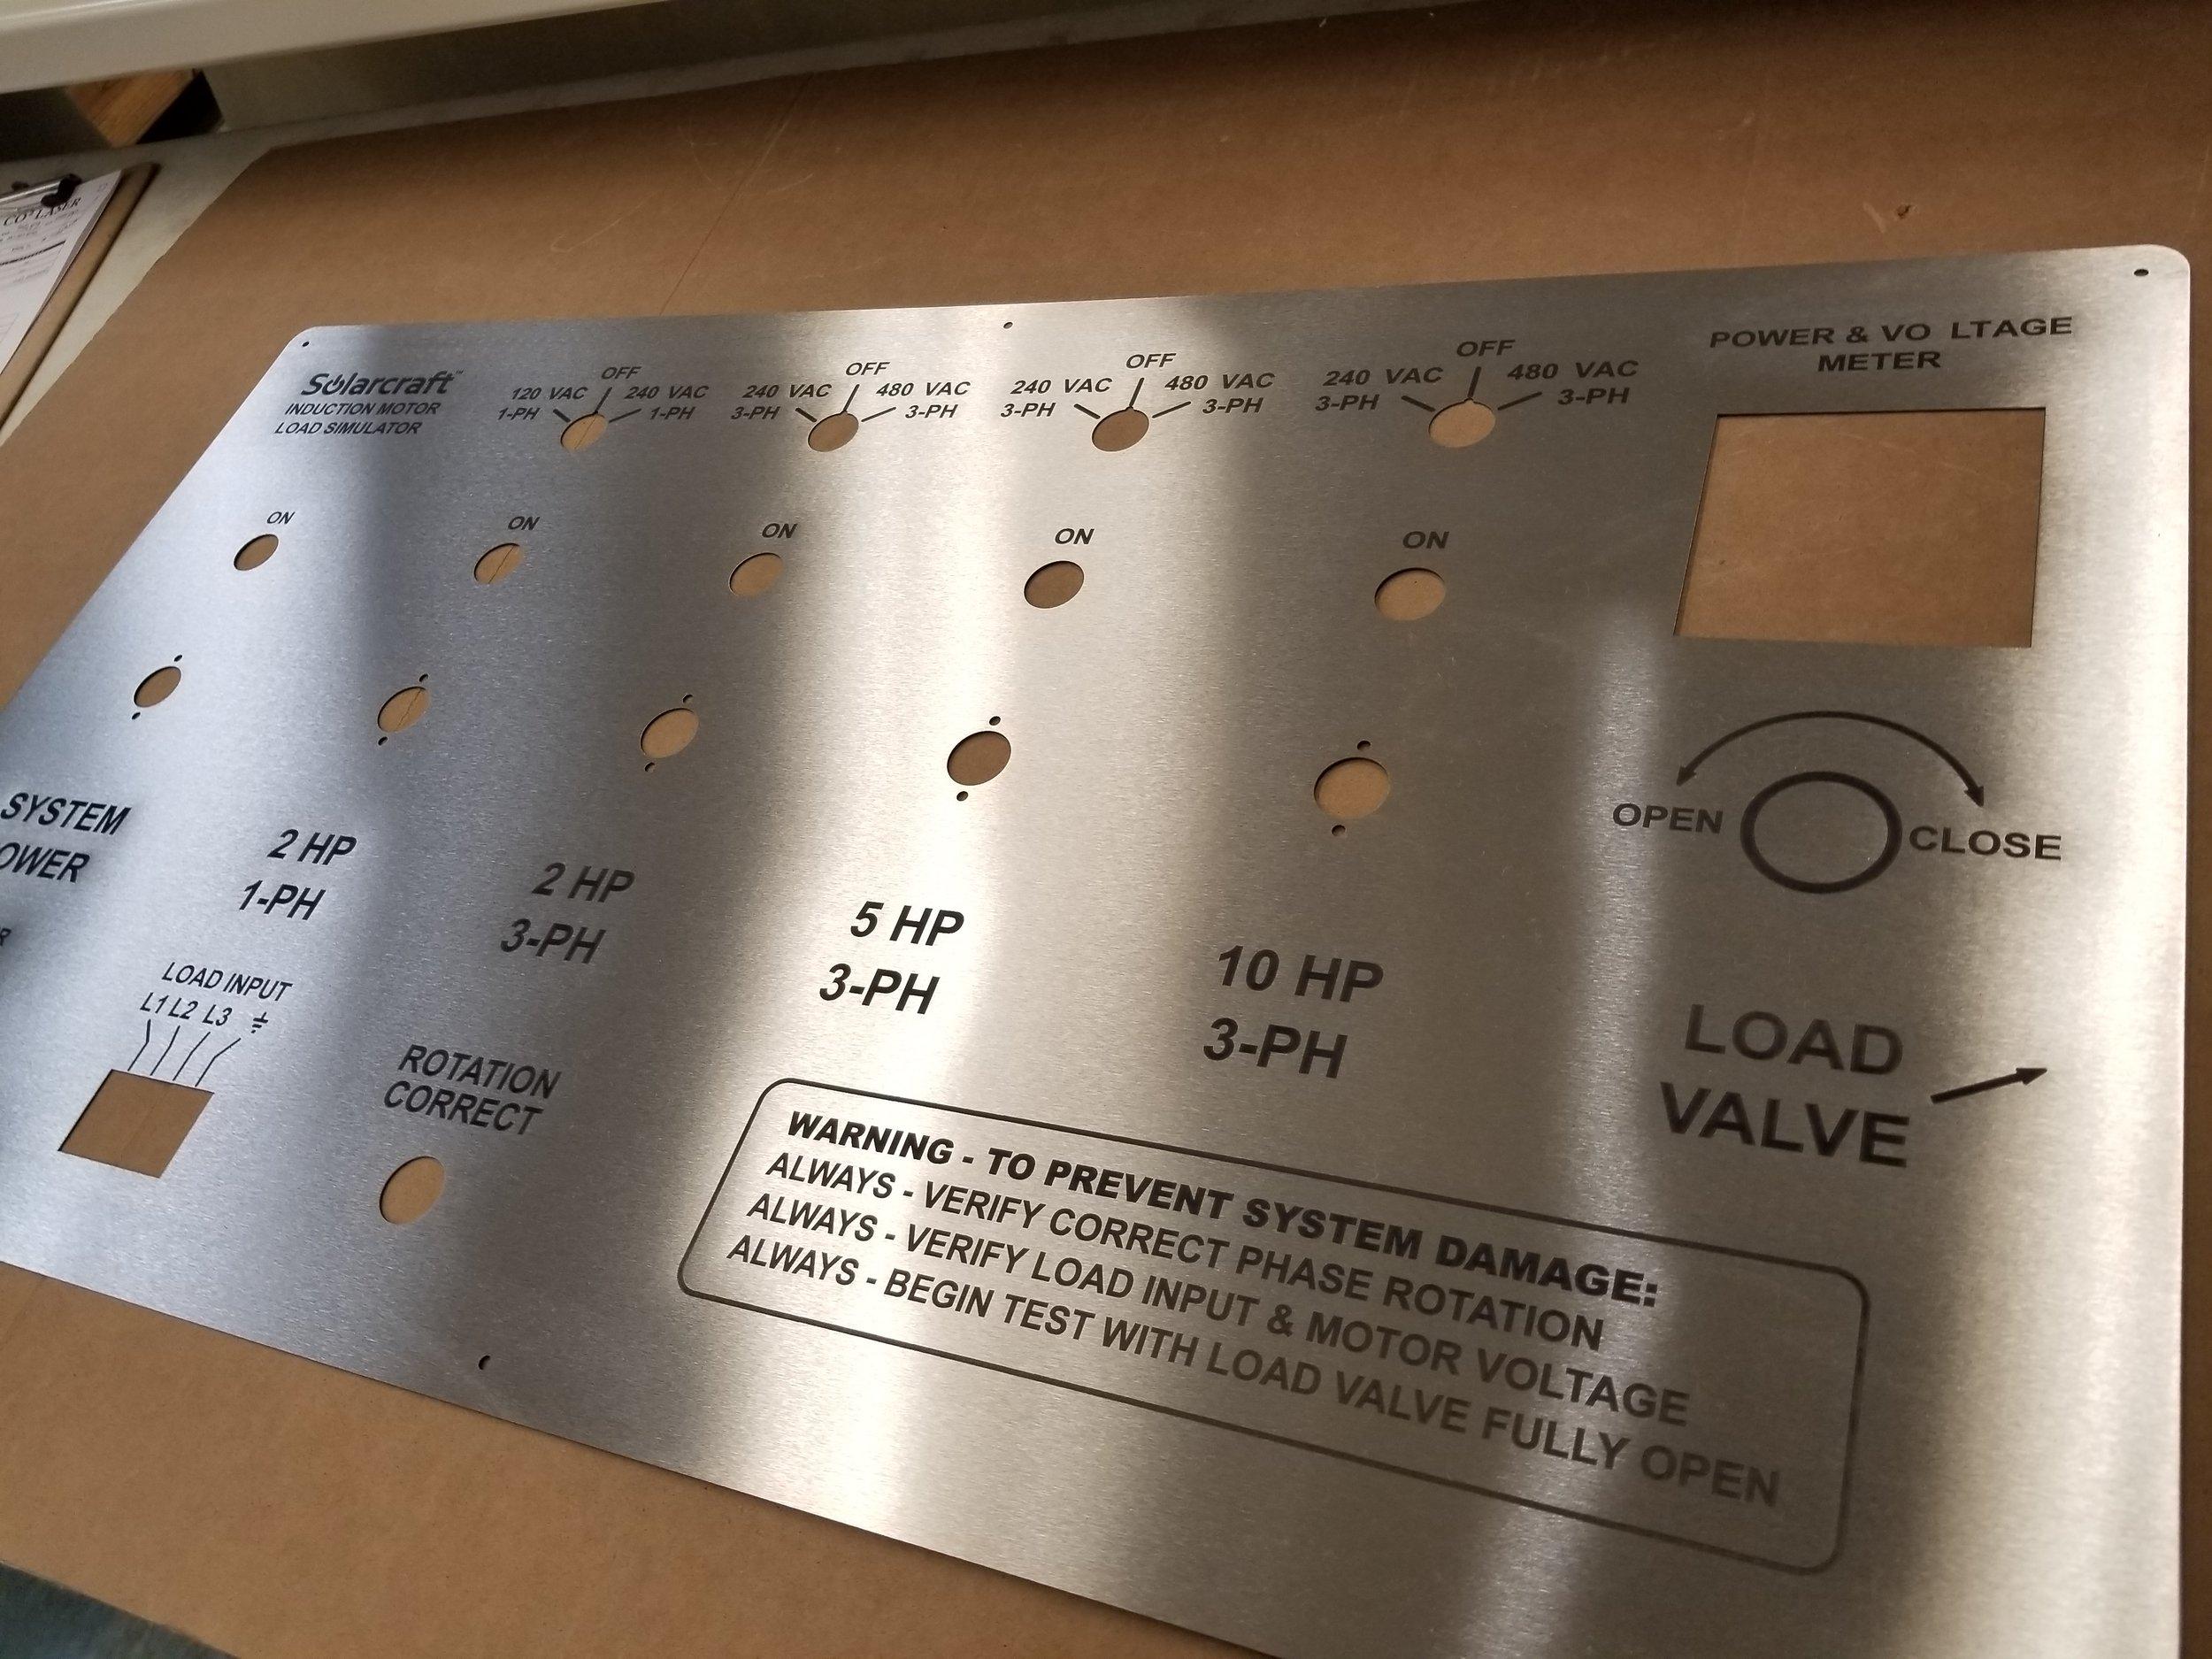 Custom Engraved Schematics - Laser Engraved Stainless Steel Schematic Panel - Engraved Panel - Stainless Steel Engraving - Schematic Engraving - Schematic Marking - Industrial Engraving